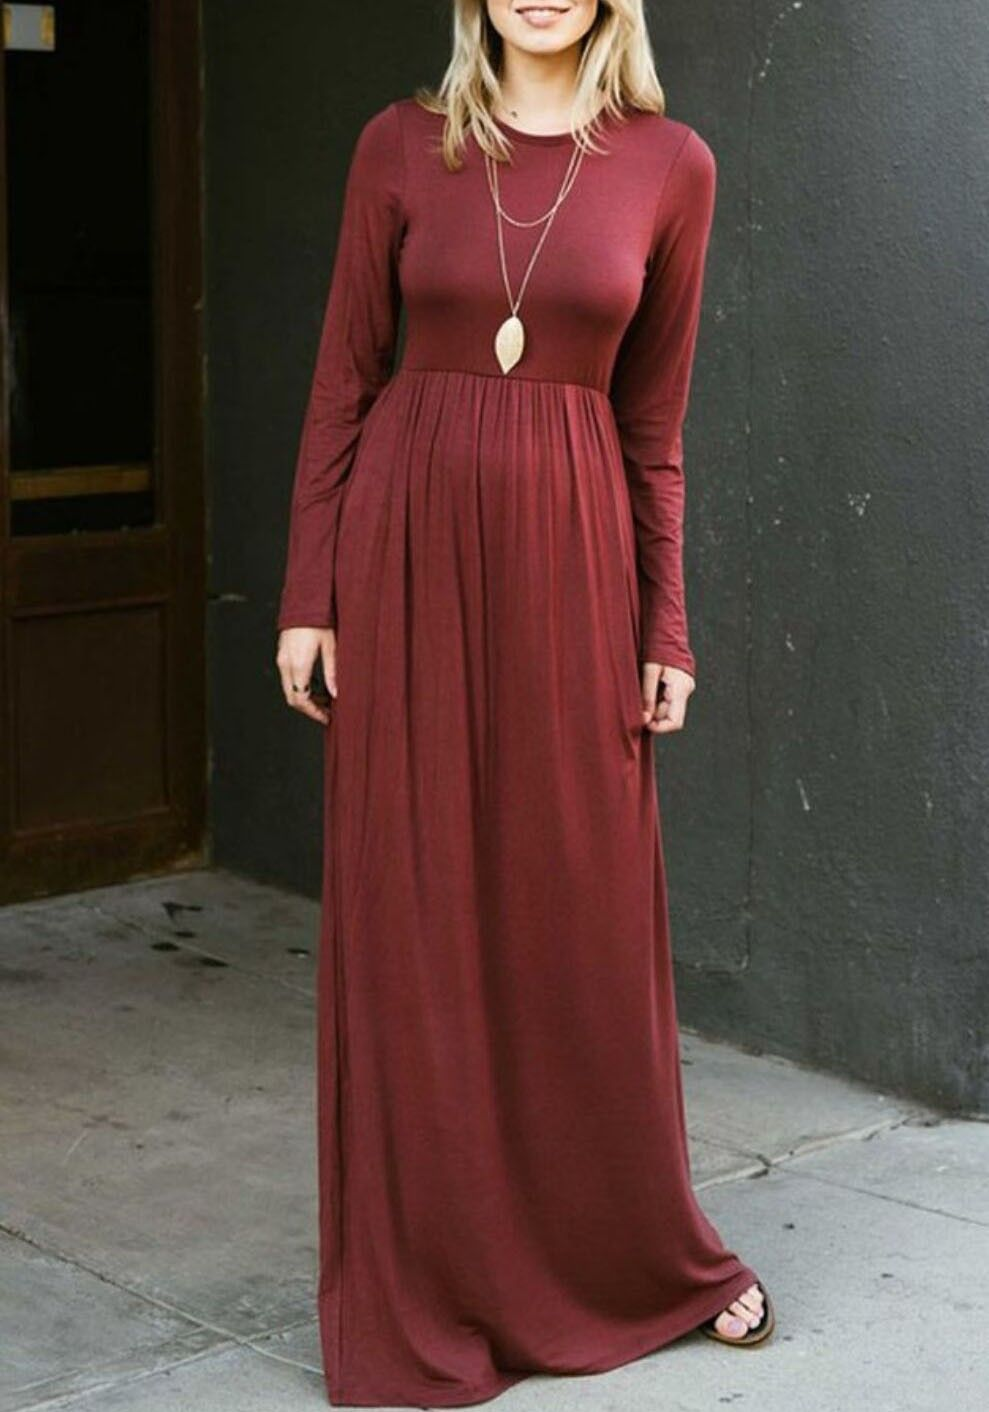 Wine Red Draped Pockets Round Neck Long Sleeve Casual Maxi Dress Maxi Dress Shop Maxi Dresses Womens Maxi Dresses [ 1412 x 989 Pixel ]